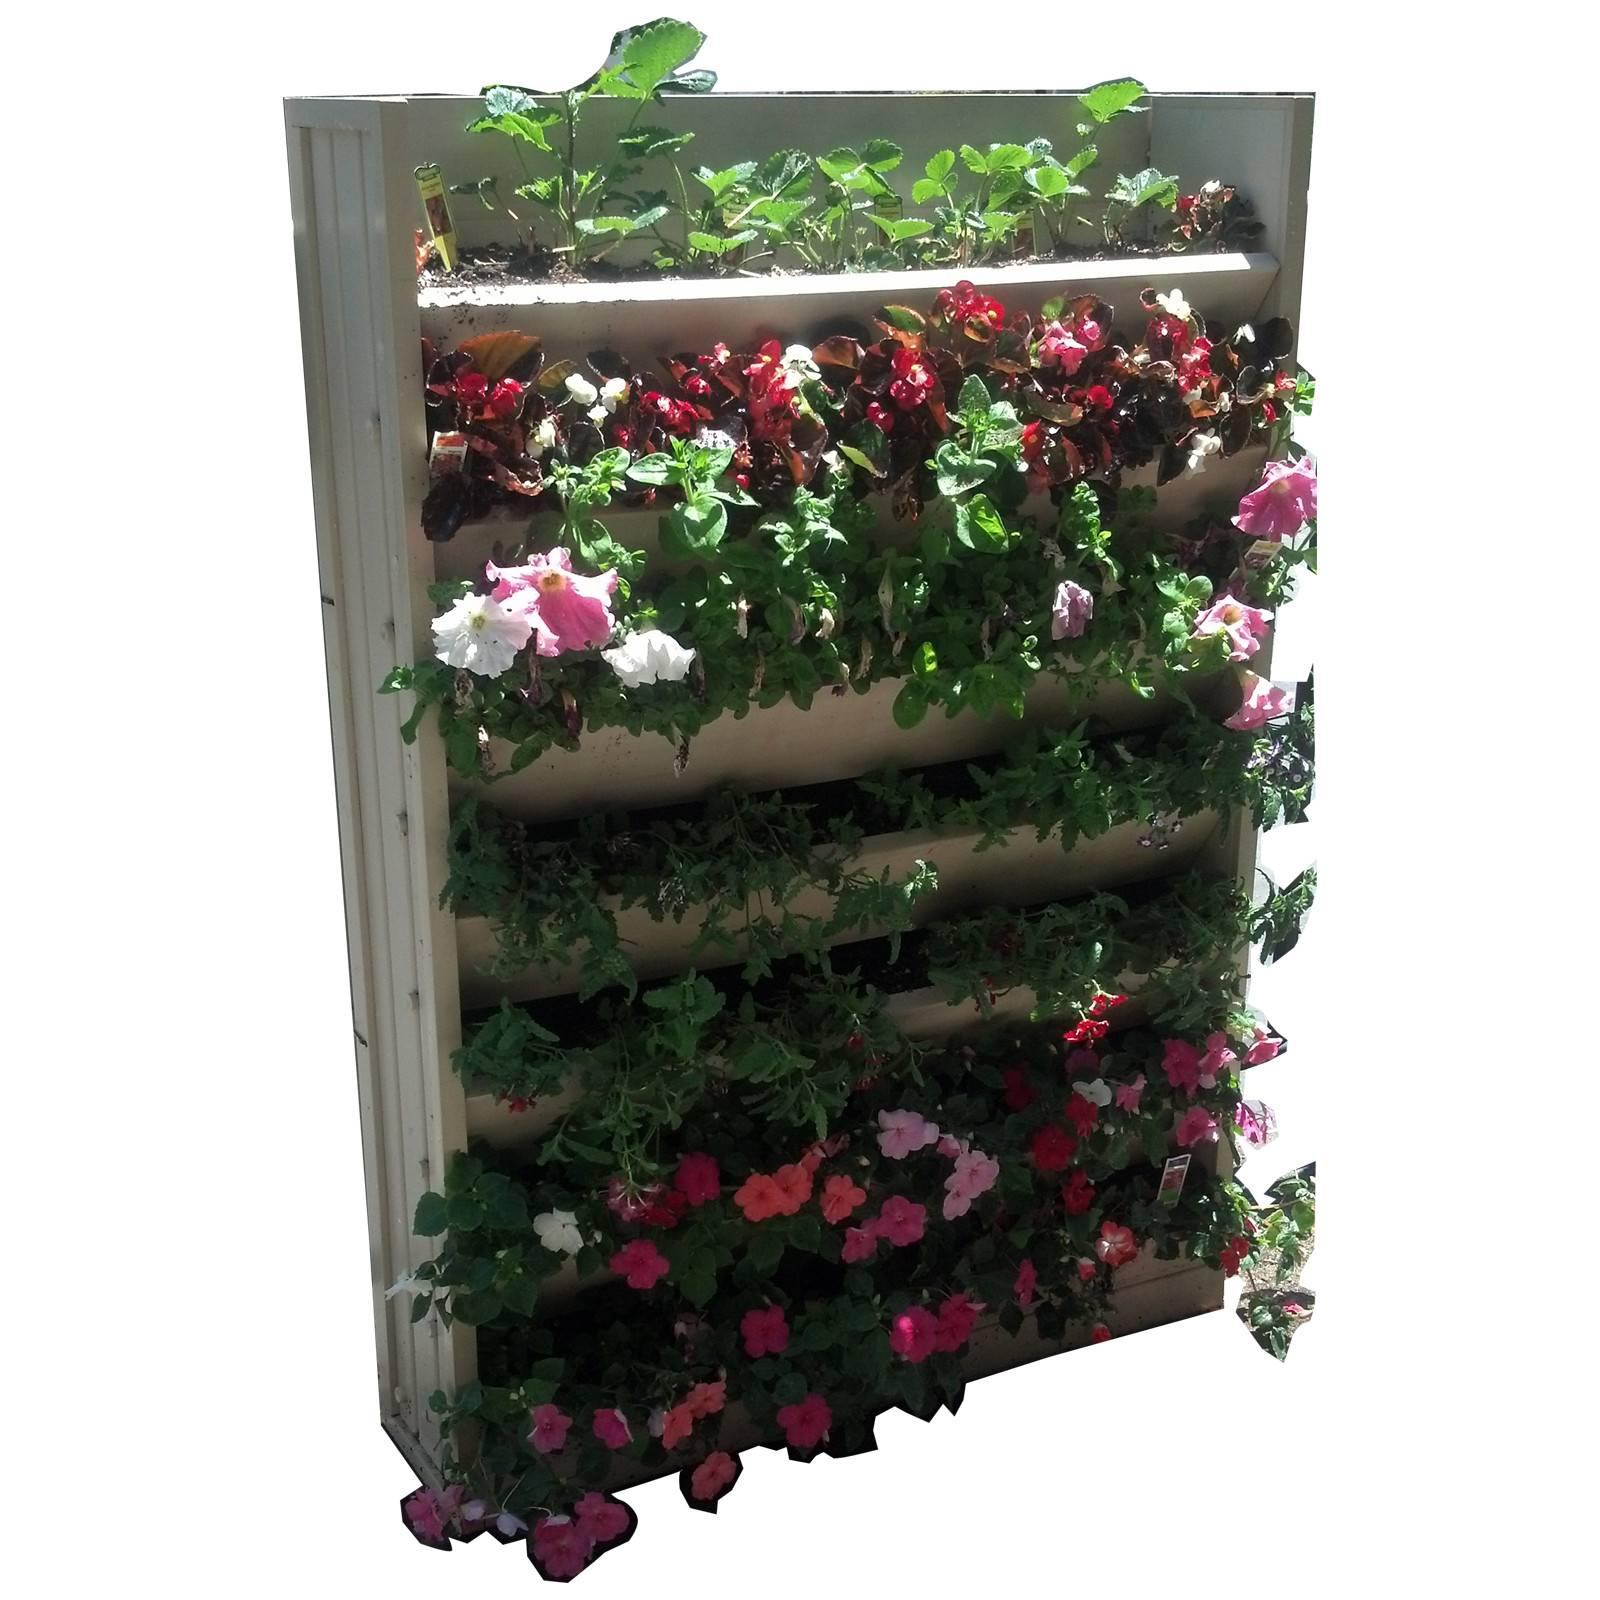 New Age Garden Novelty Wall Planter Reviews Wayfair